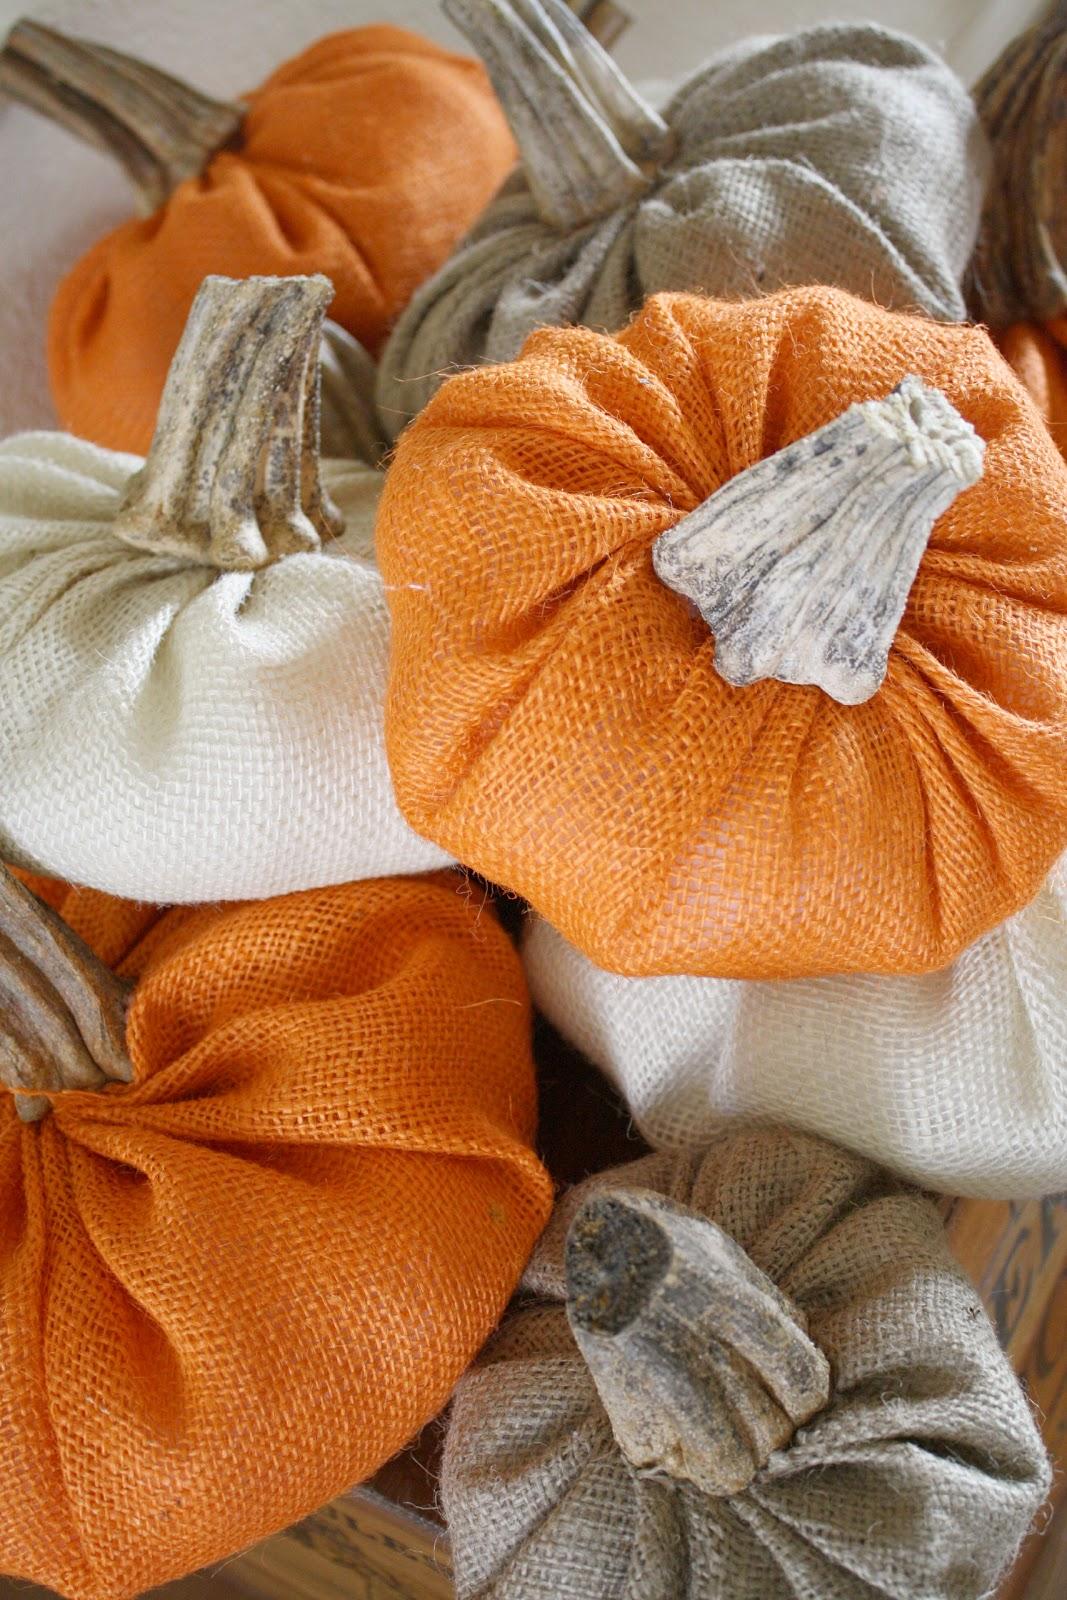 DIY Burlap Pumpkins With Real Stems